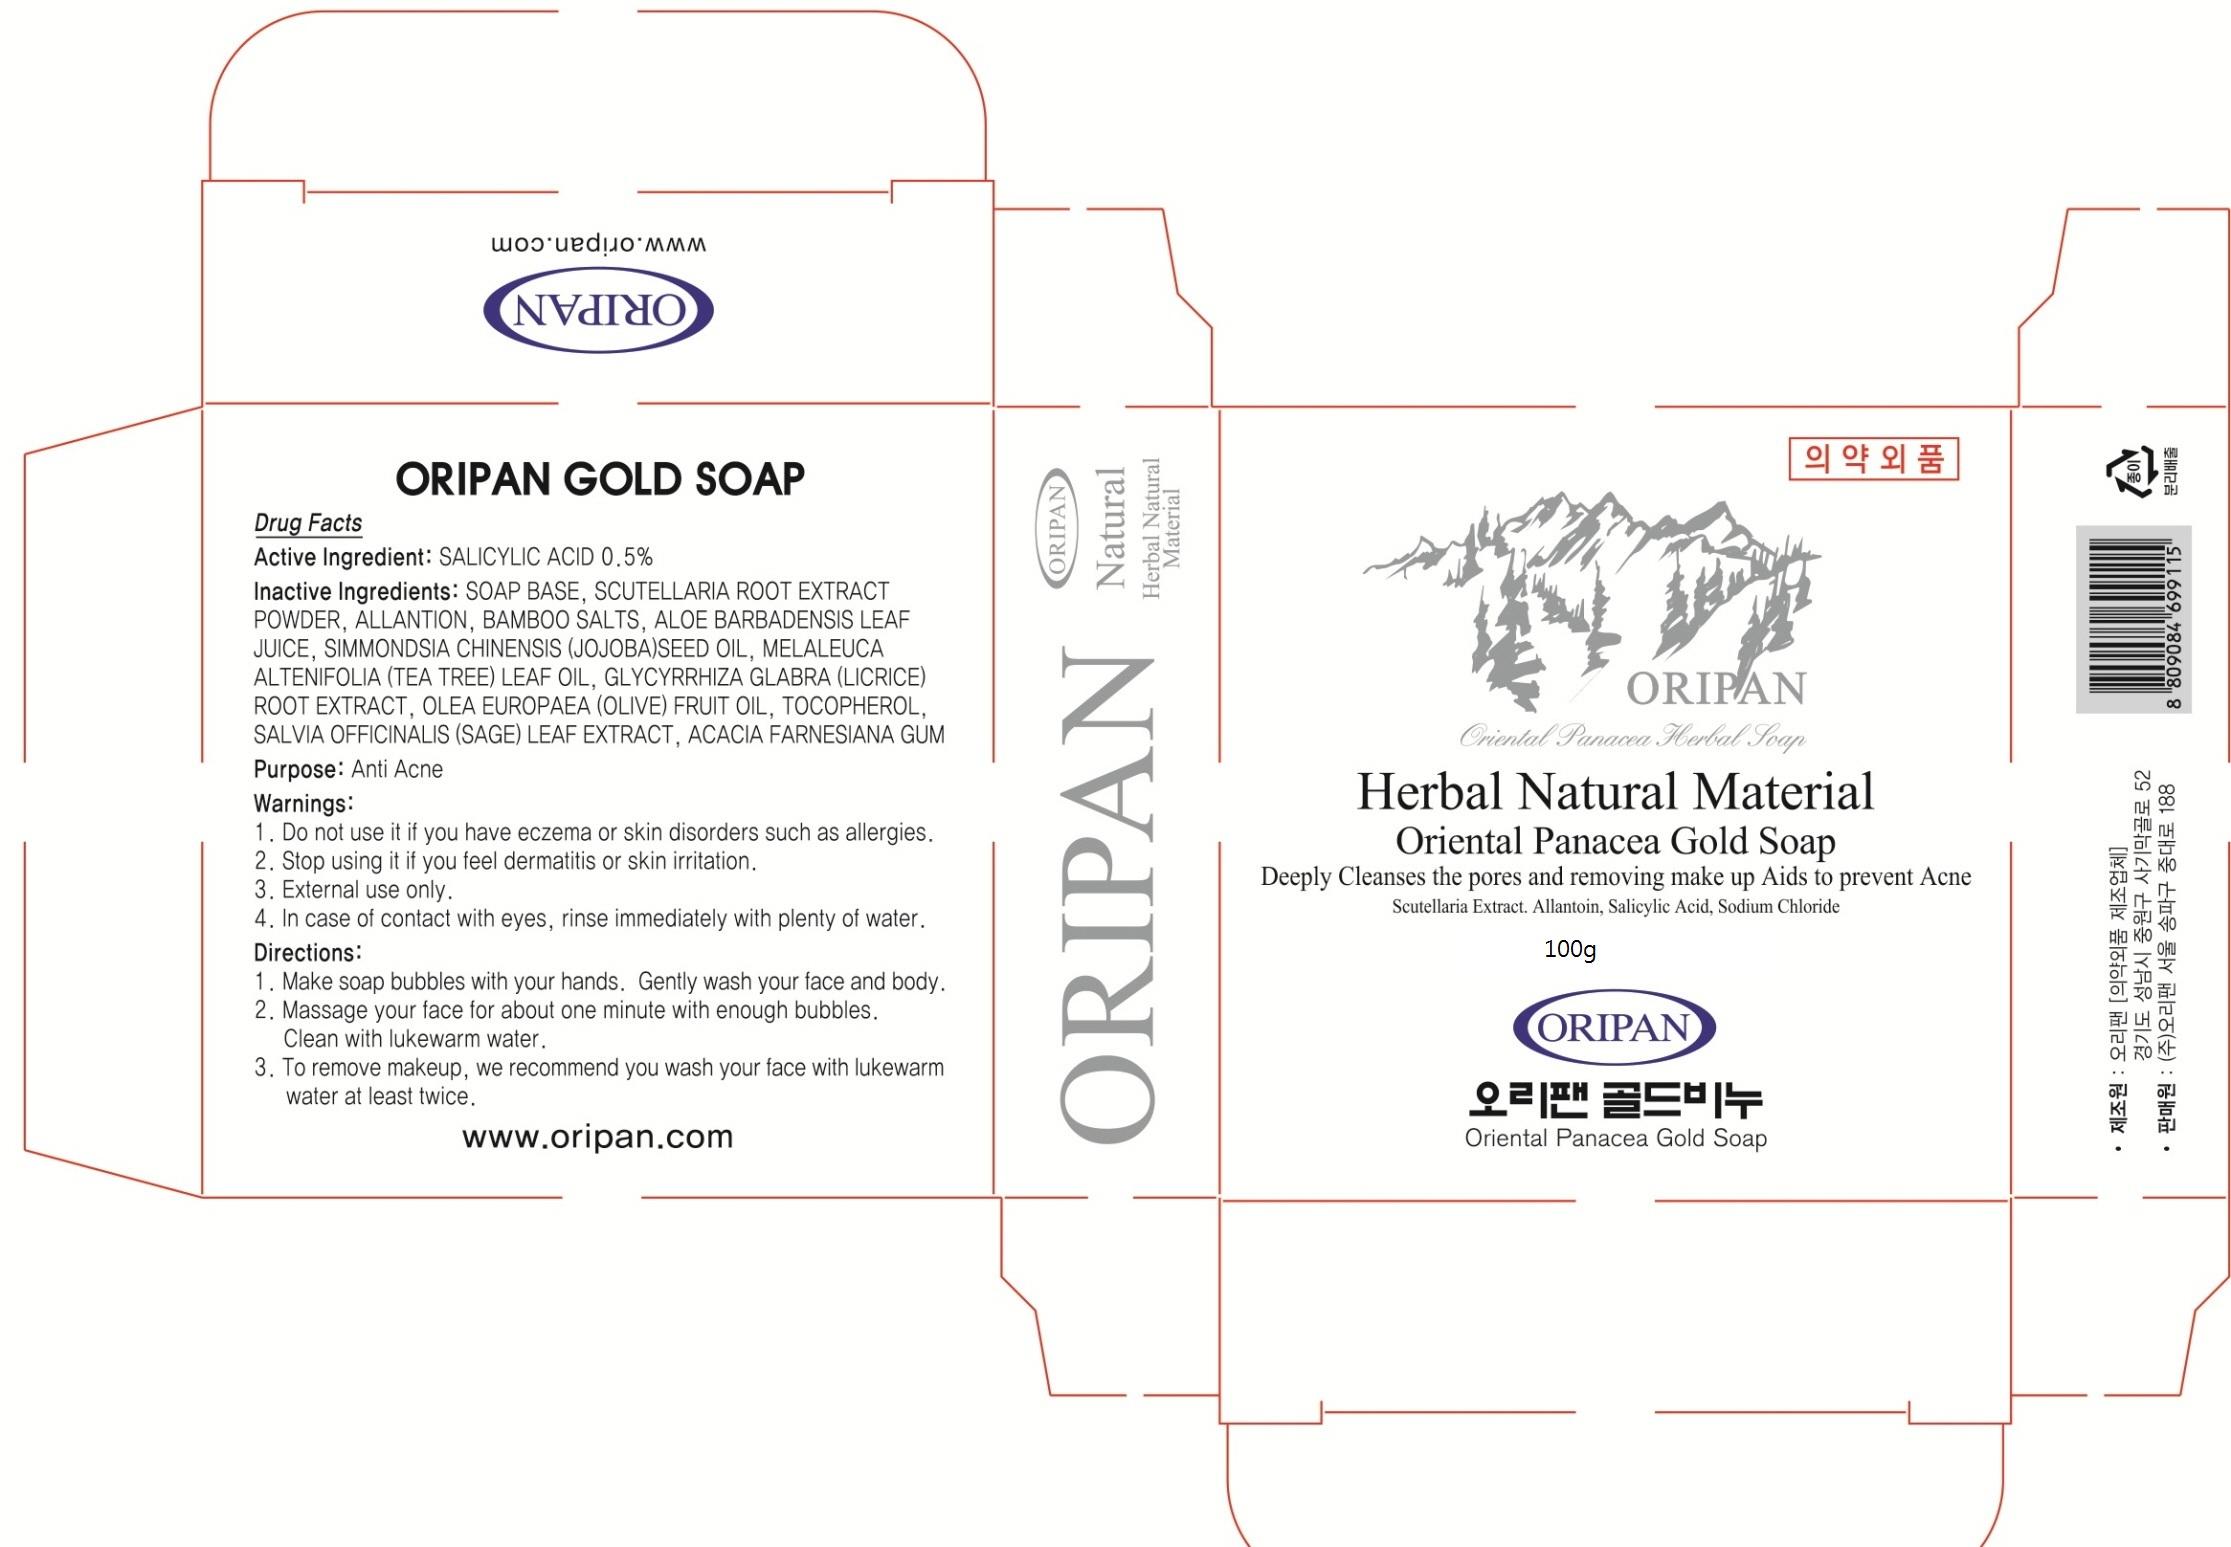 Oripan Gold 100g   Salicylic Acid Soap Breastfeeding